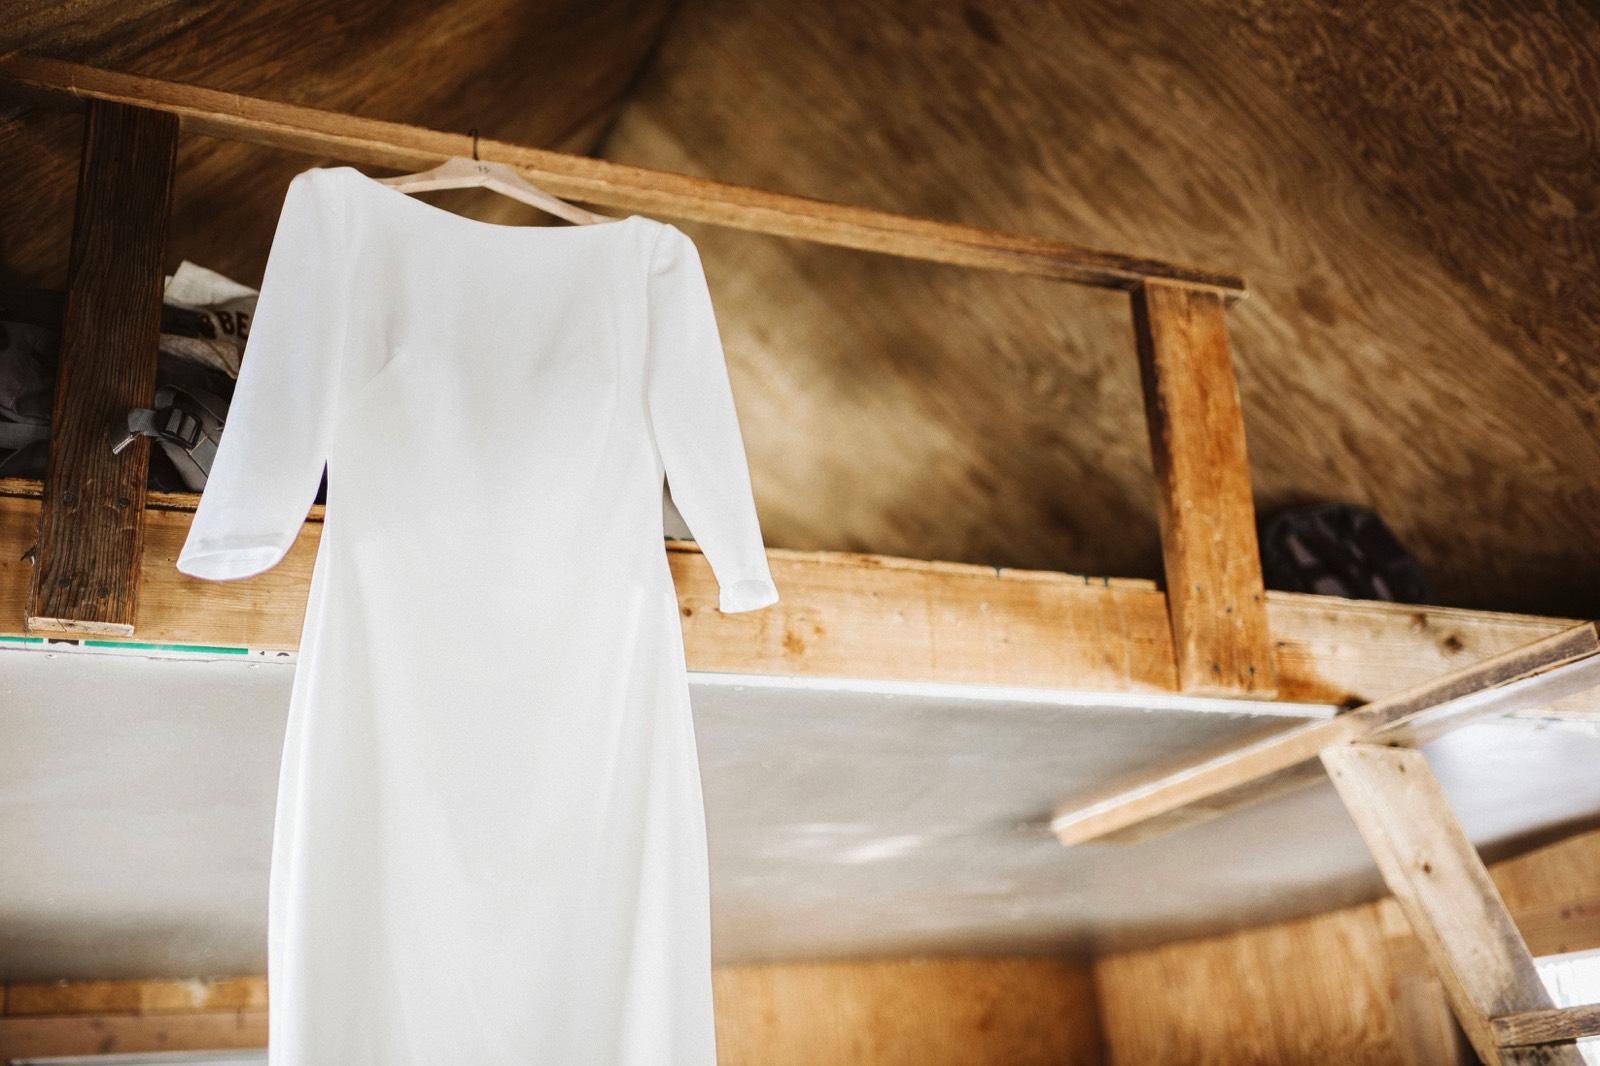 alpine-lakes-high-camp-winter-wedding-07 ALPINE LAKES HIGH CAMP WEDDING